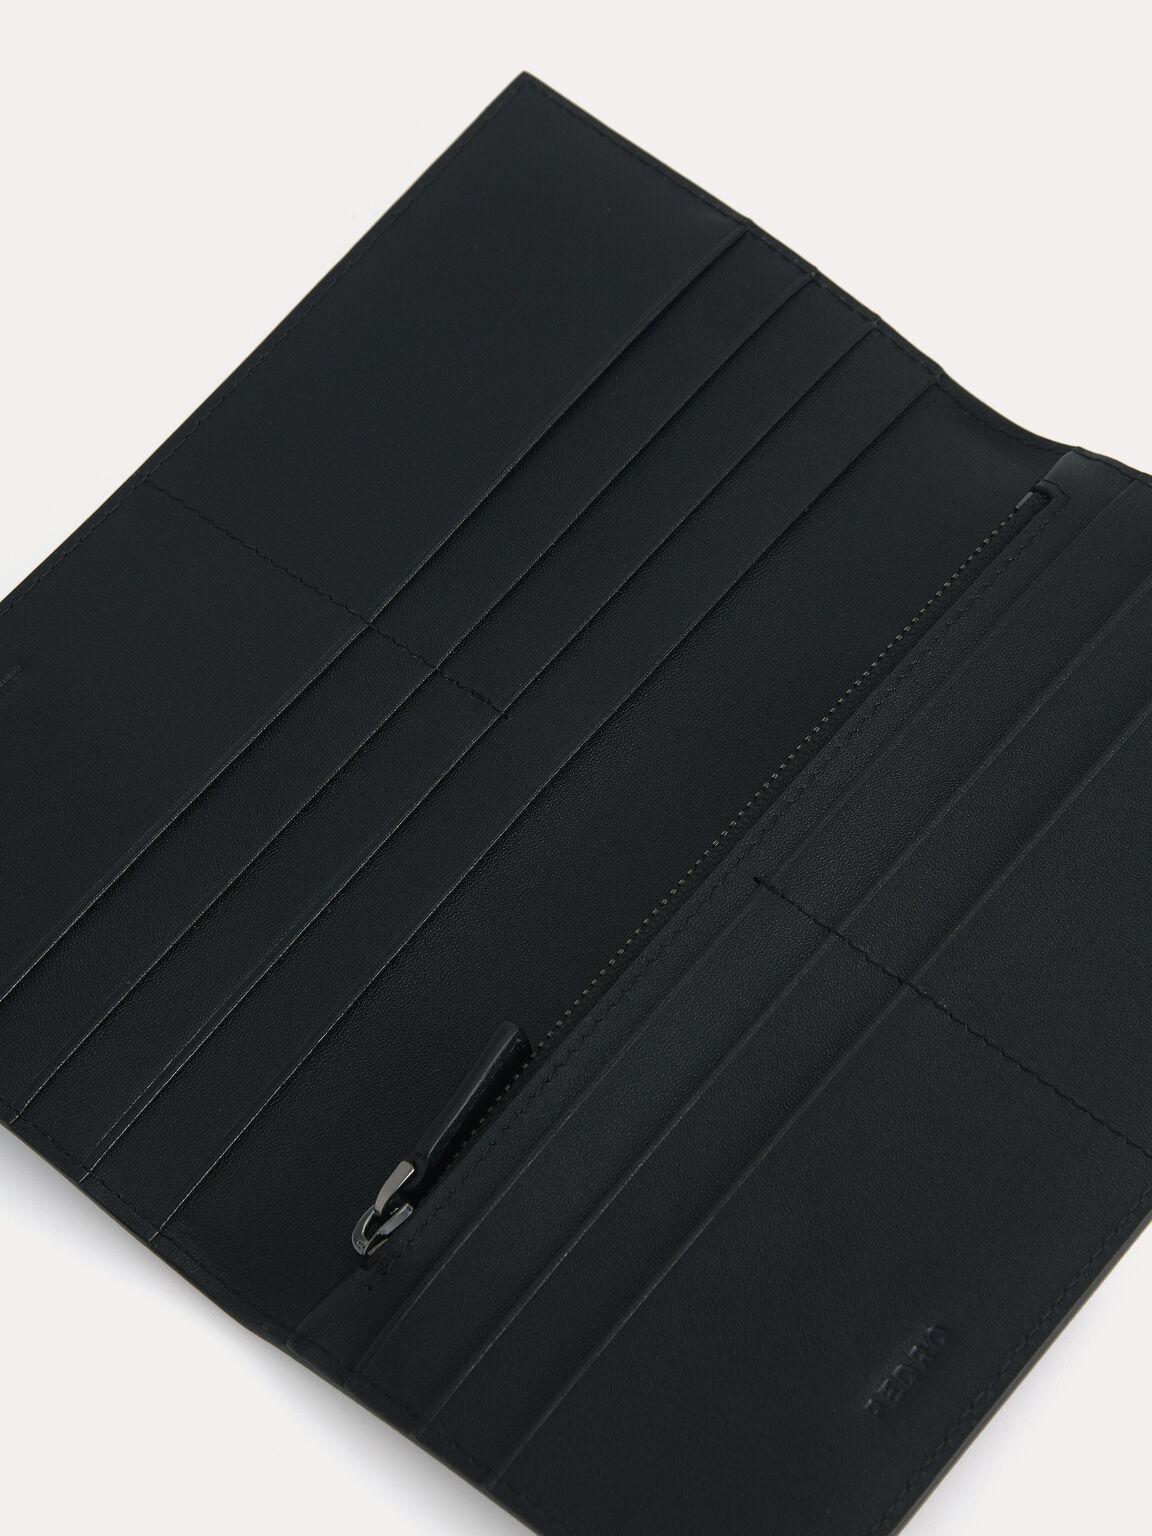 Long Textured Leather Wallet, Black, hi-res